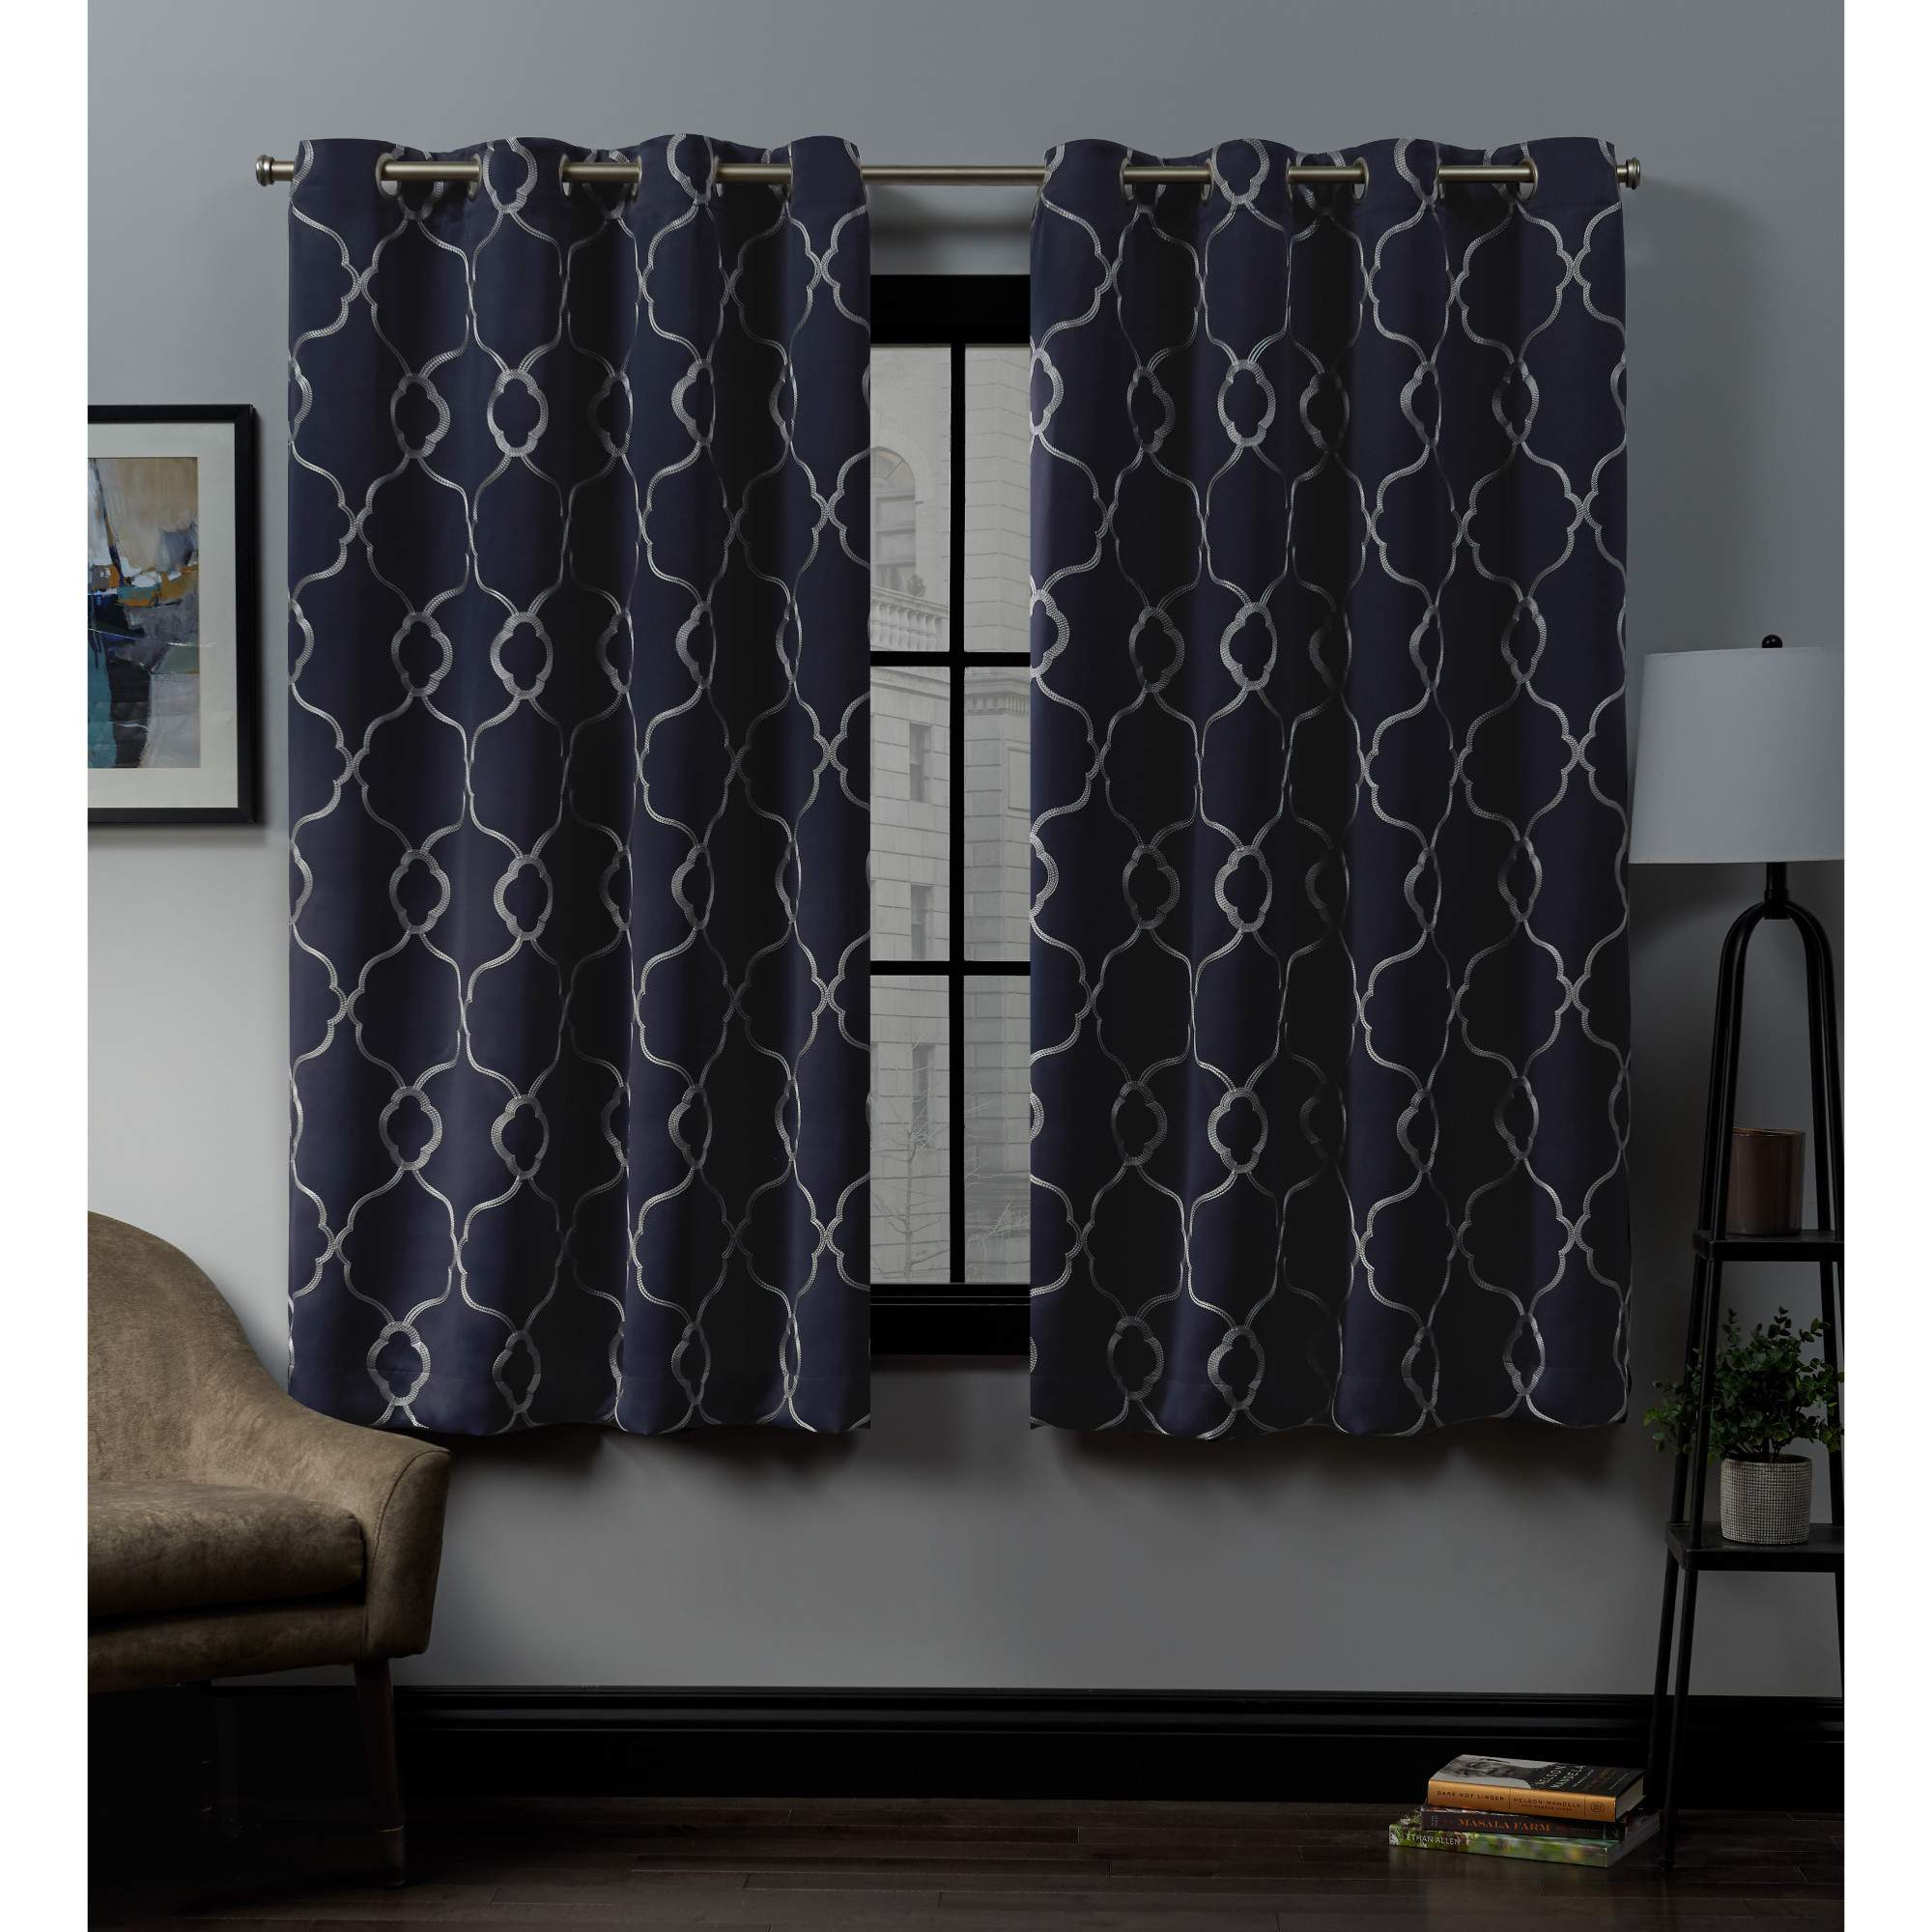 Exclusive Home Belmont Woven Blackout Grommet Top Curtain Panel Pair